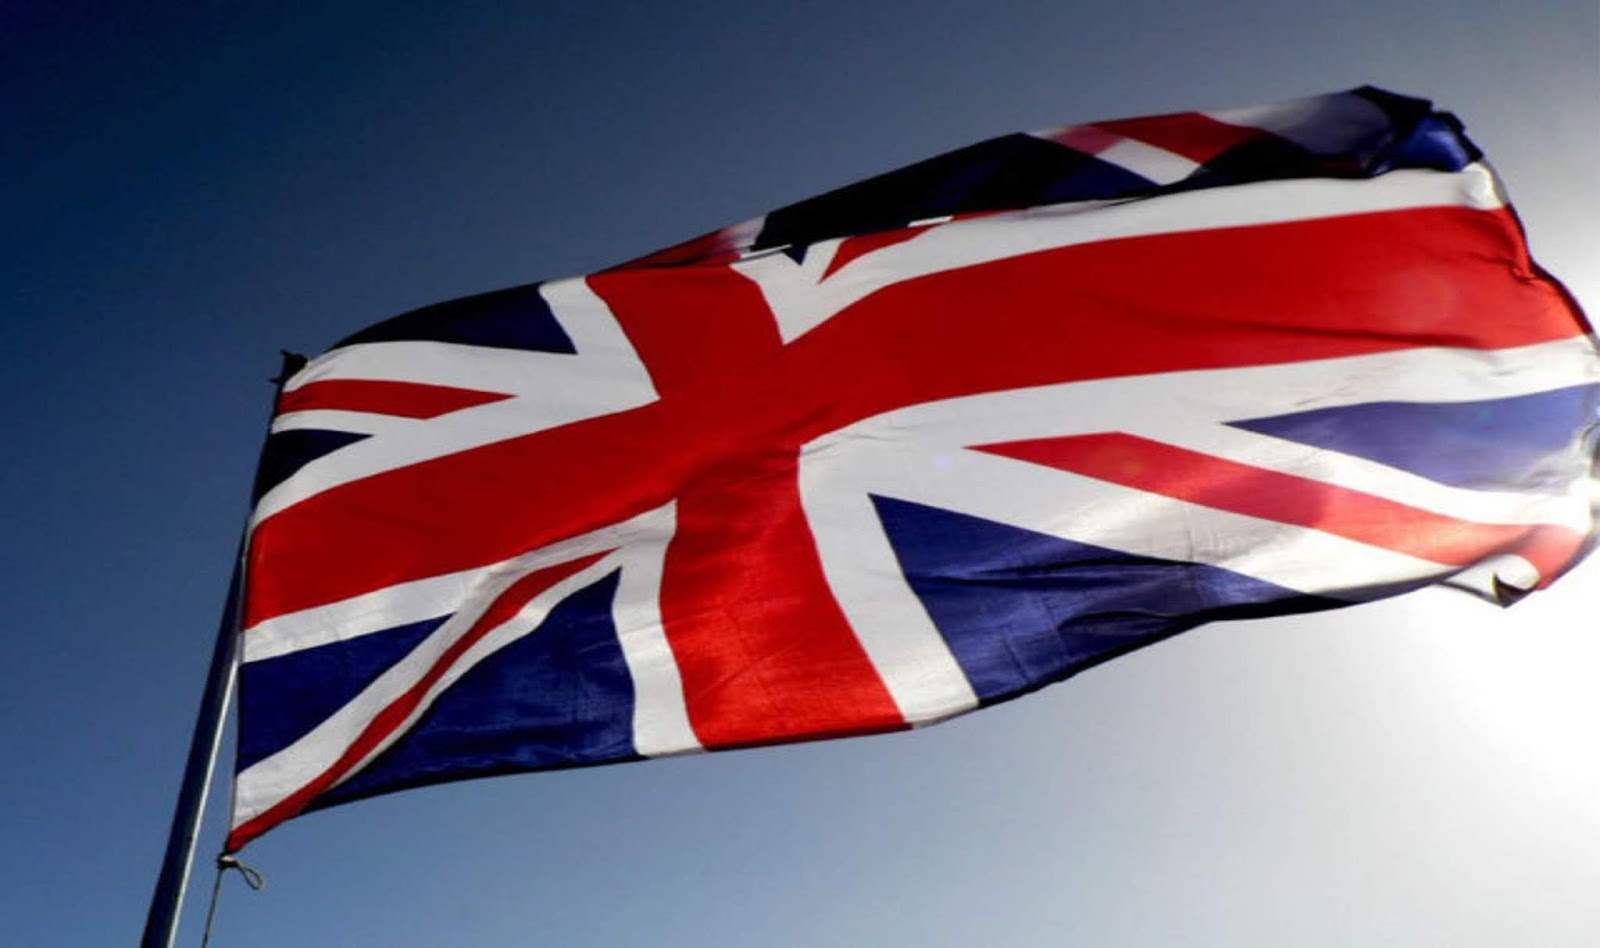 Inggris tidak melihat cara untuk meningkatkan hubungan dengan Rusia